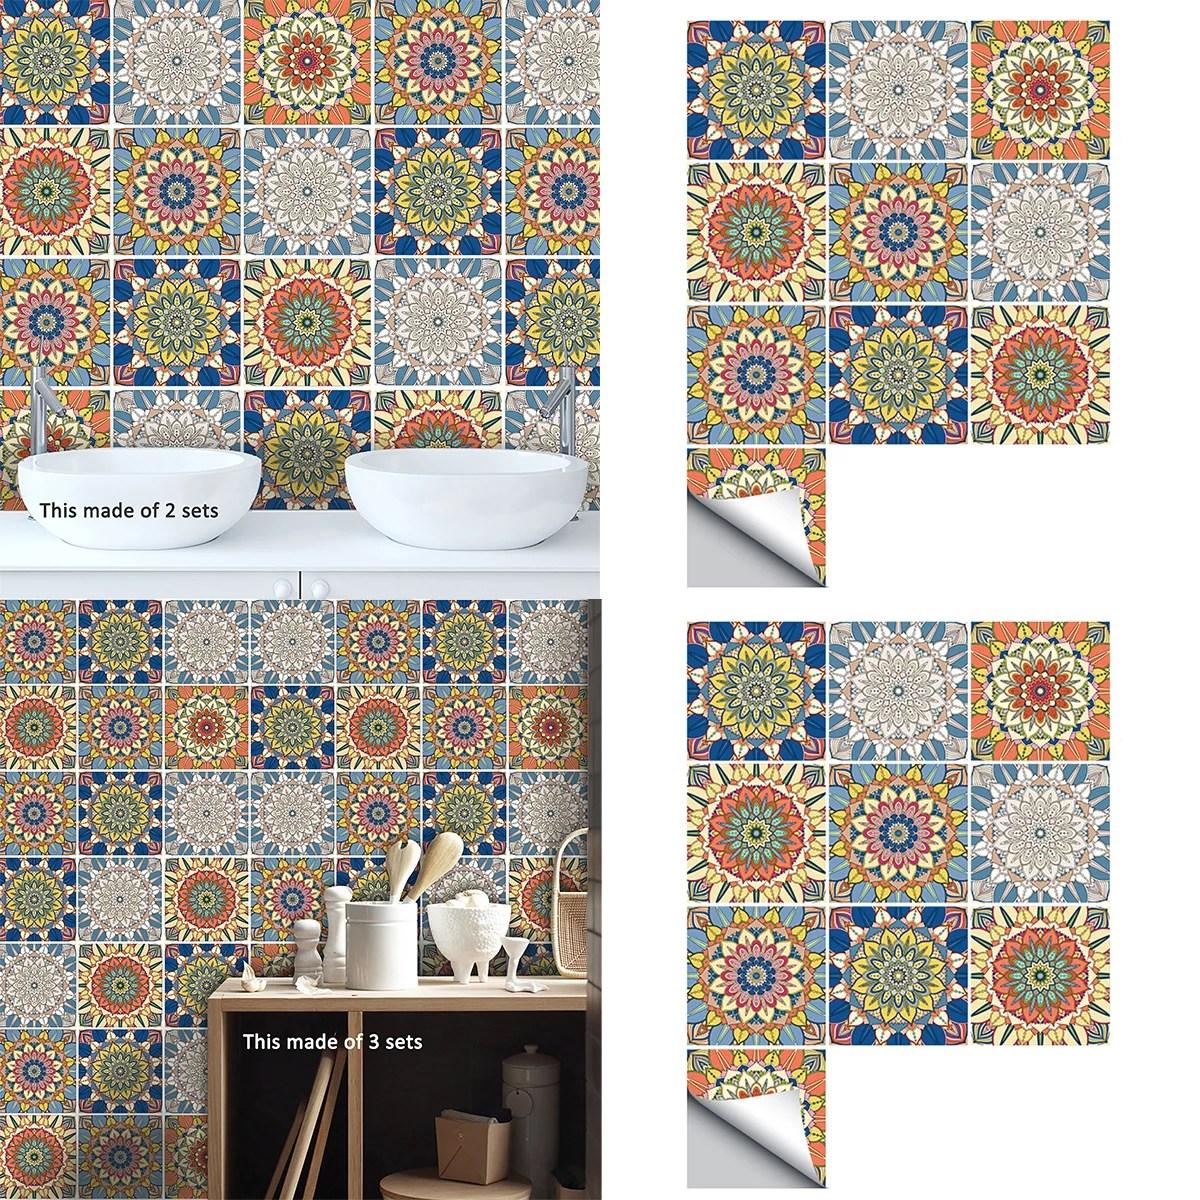 goory tile decals set of 10 self adhesive peel and stick tile stickers for kitchen backsplash bathroom vinyl waterproof